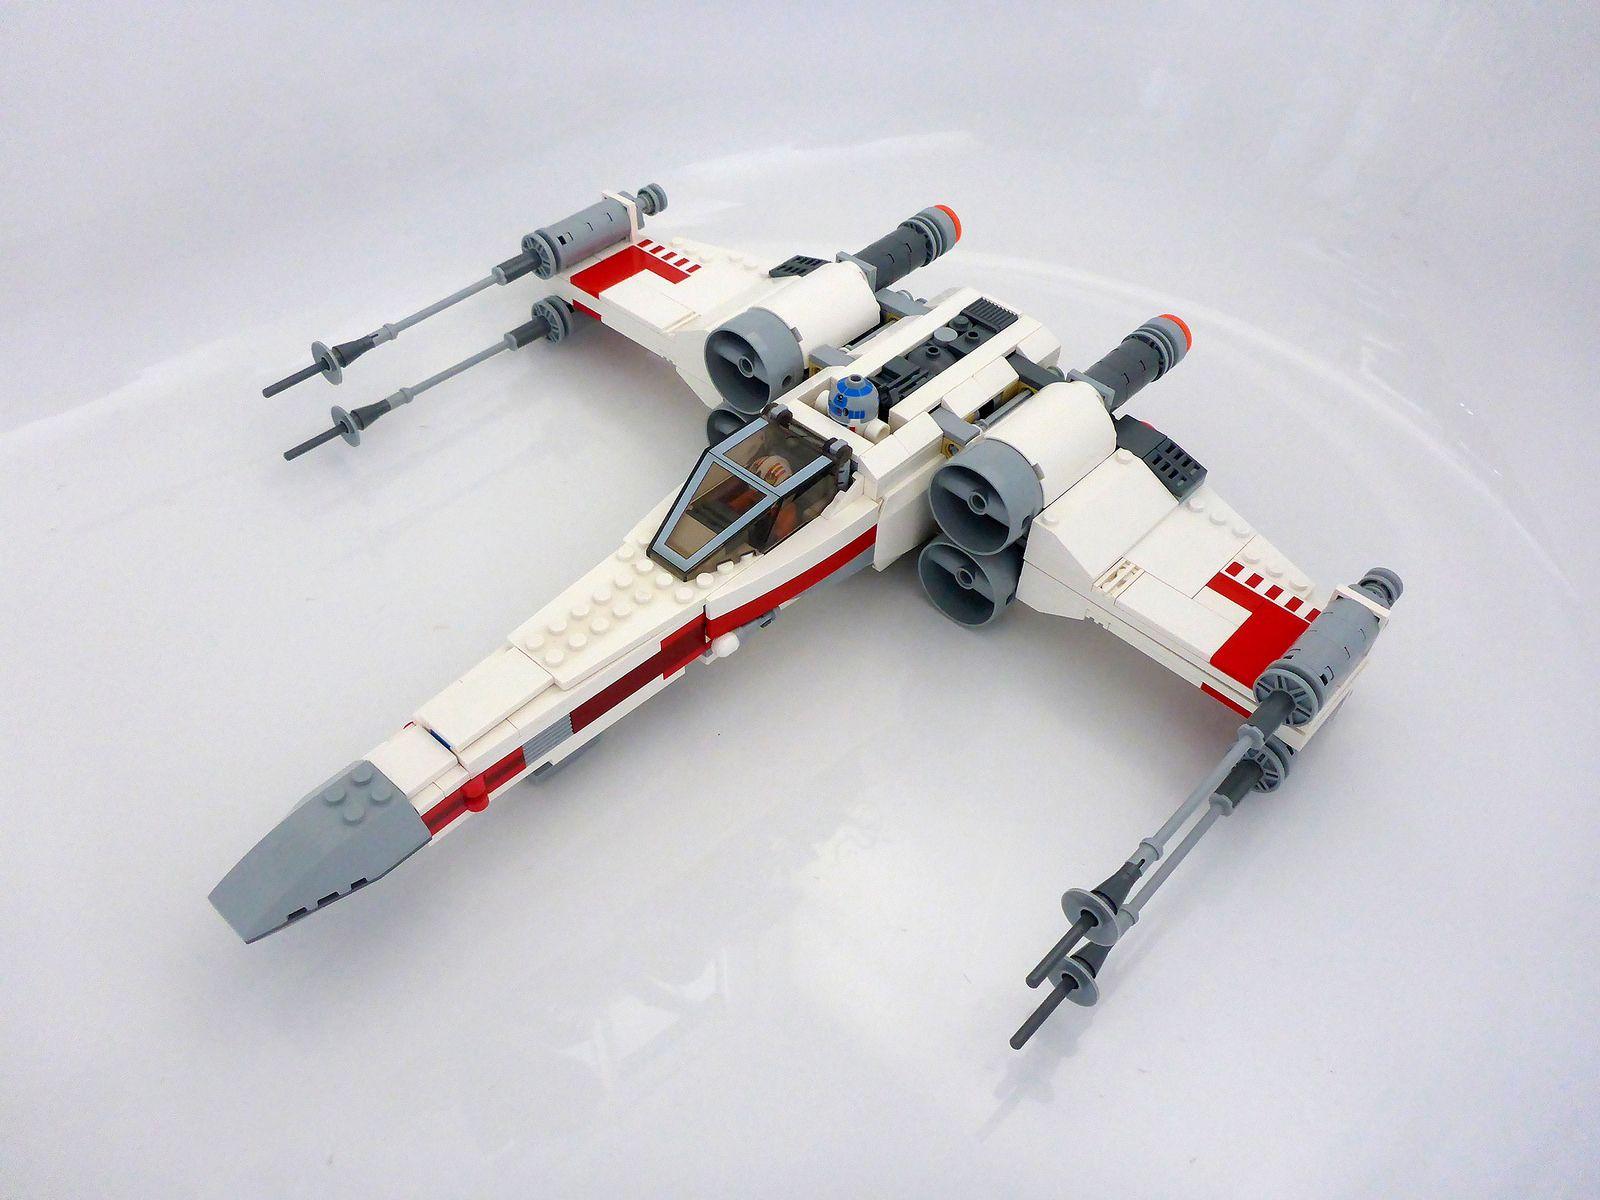 Lego X-Wing (With images) | Lego, Lego sets